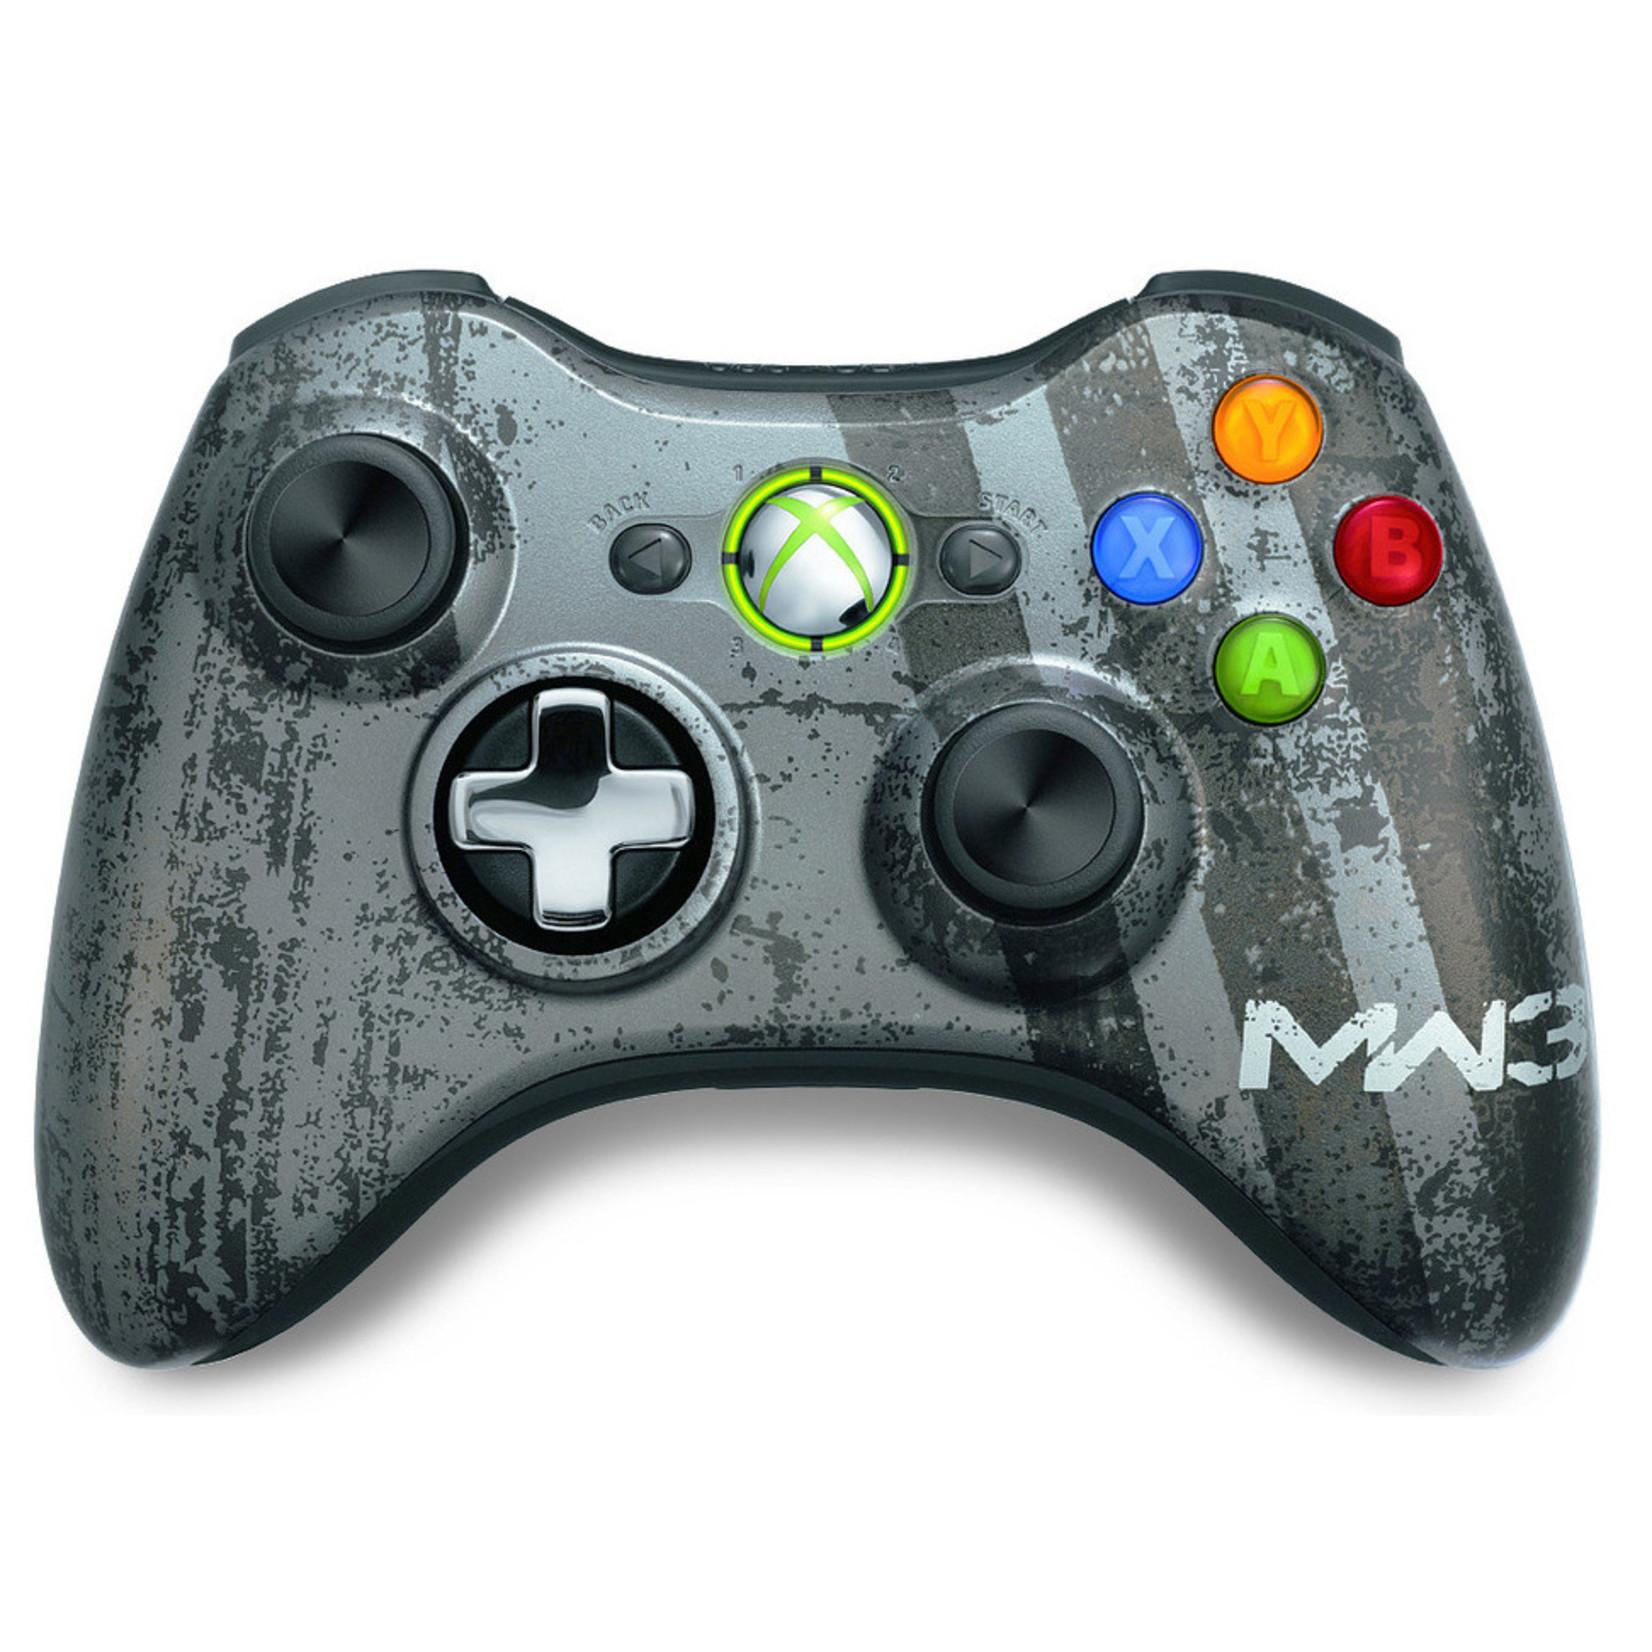 Microsoft Xbox 360 Controller - Call of Duty: Modern Warfare 3 Limited Edition